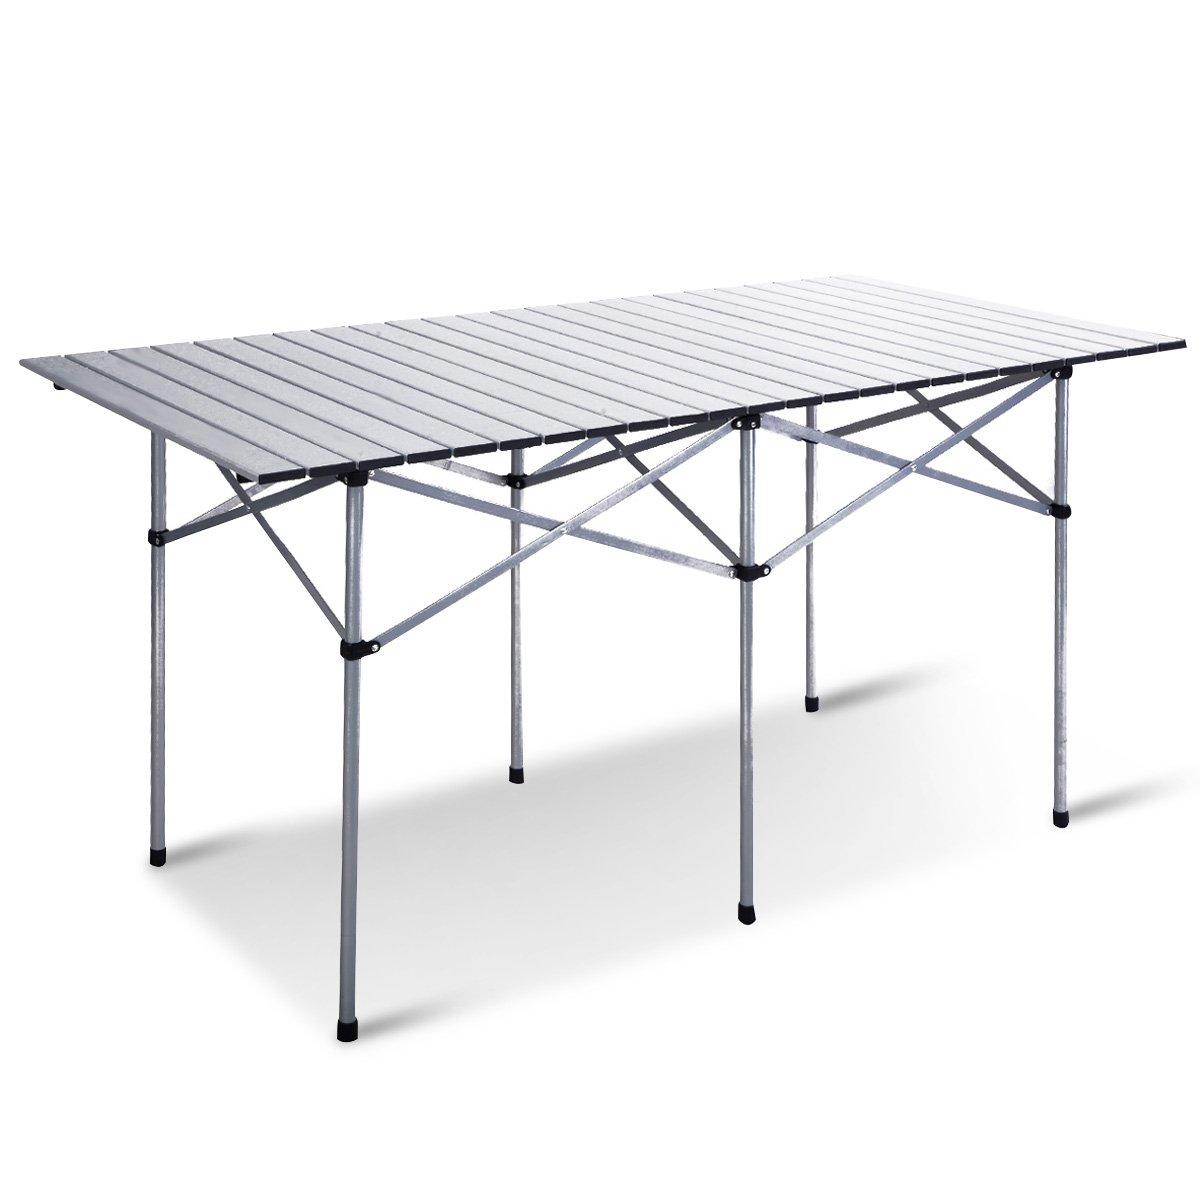 Giantex Roll Up Portable Folding Camping Square Aluminum Picnic Table w/Bag (55'')